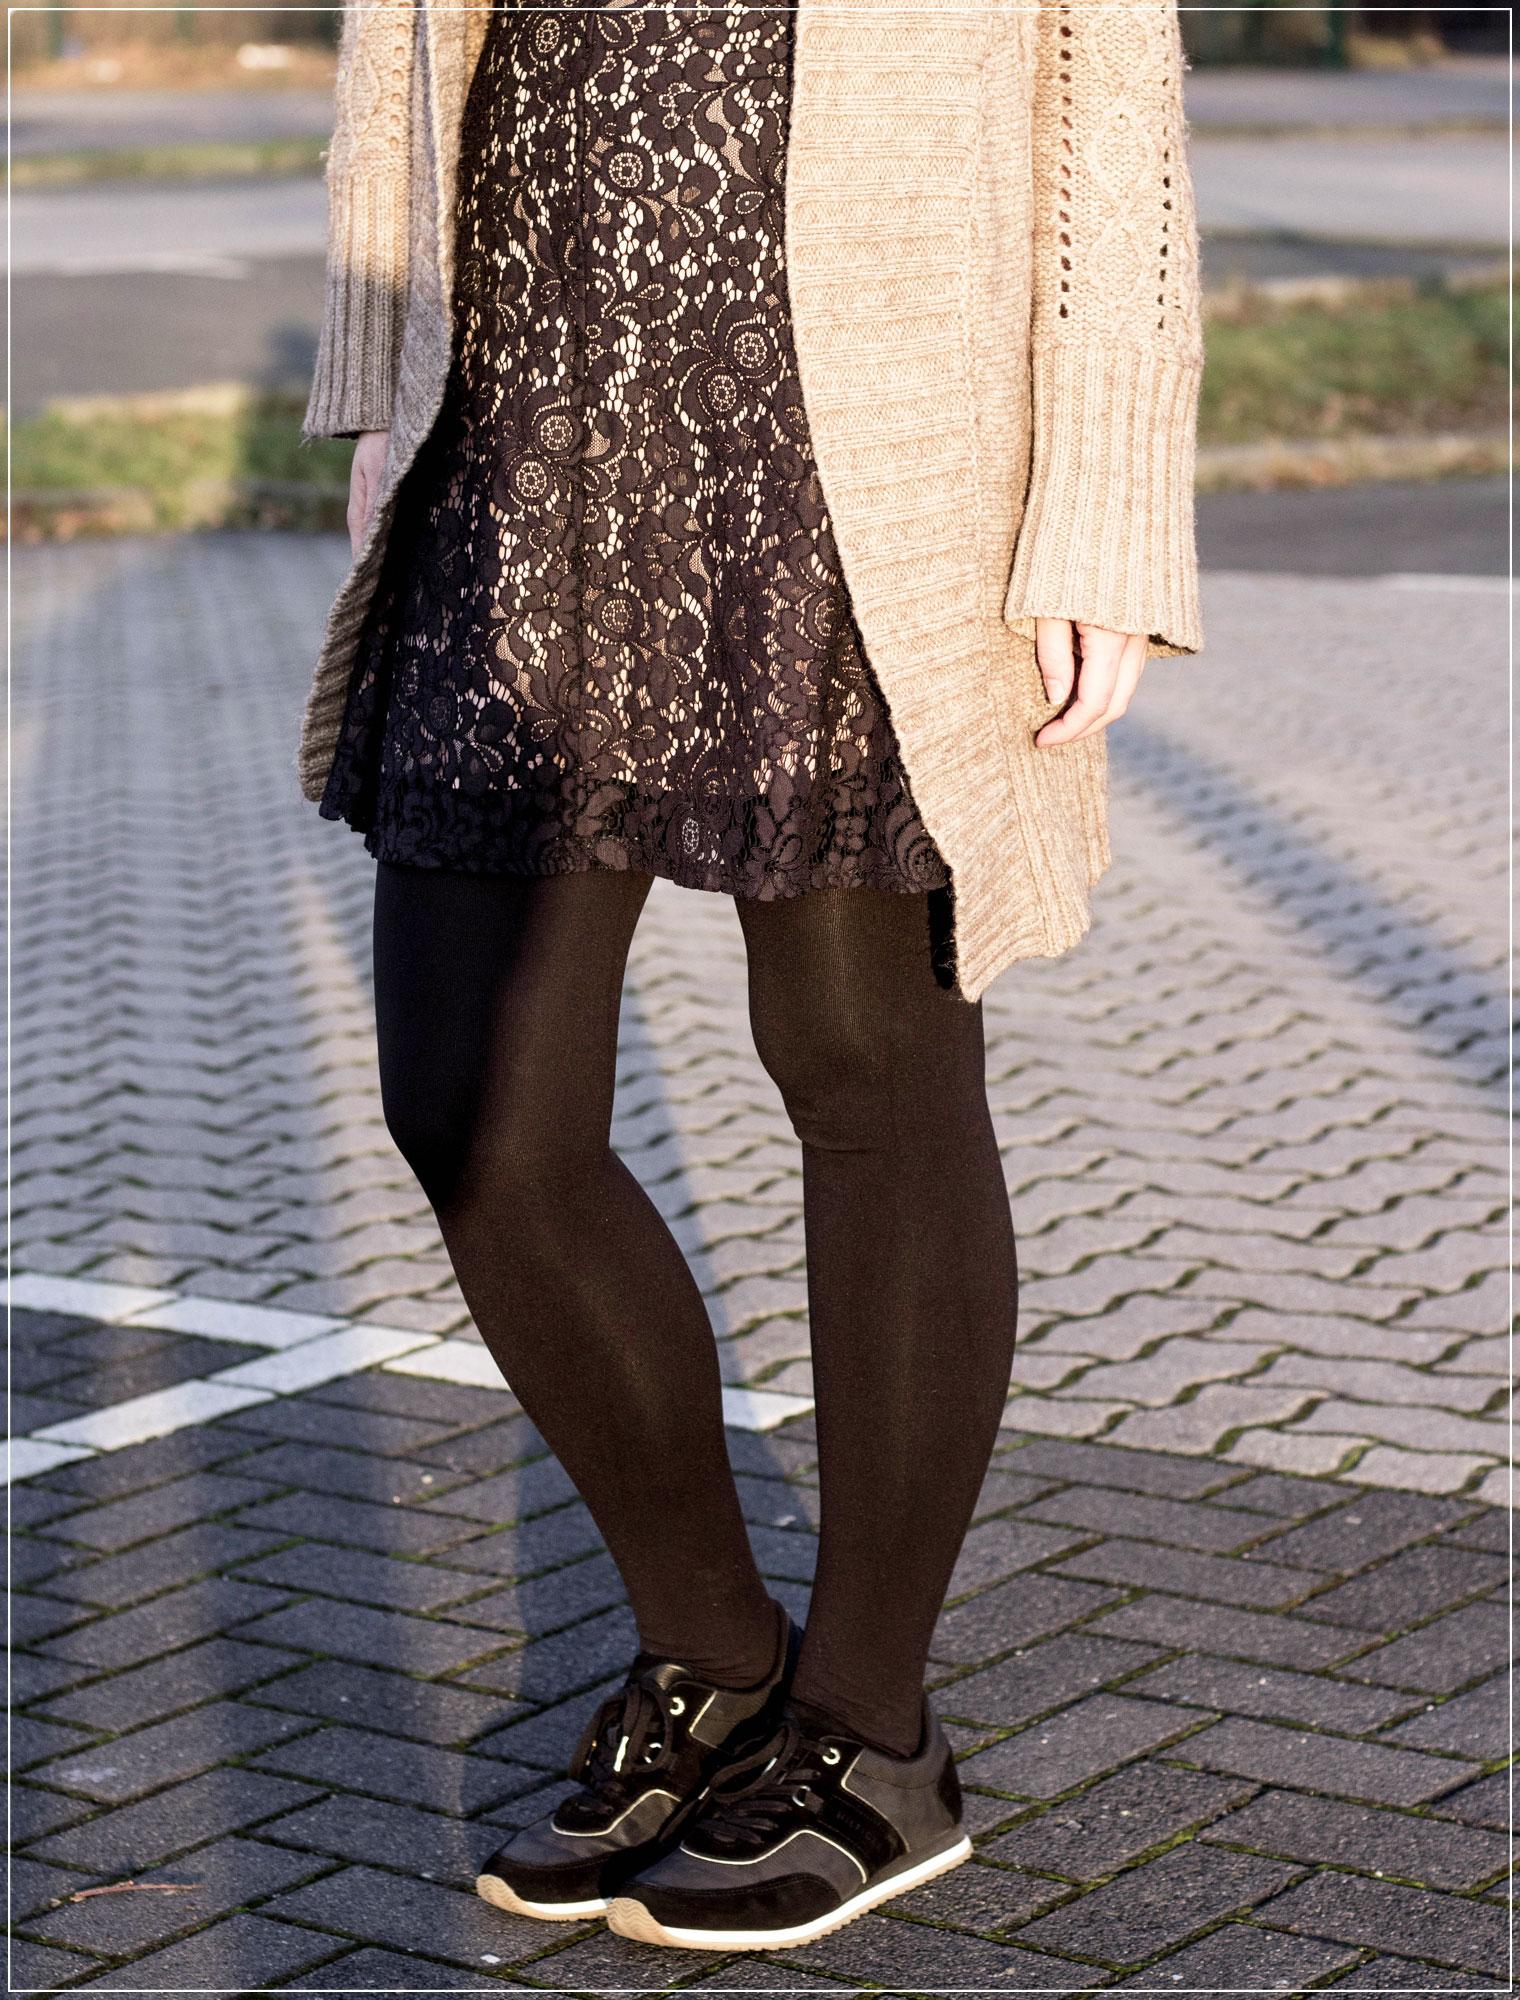 Ruhrpott, Ruhrpott Romantik, Winterstyle, Modebloggerin, Winteroutfit, Fashionbloggerin, Modeblog, Ruhrgebiet